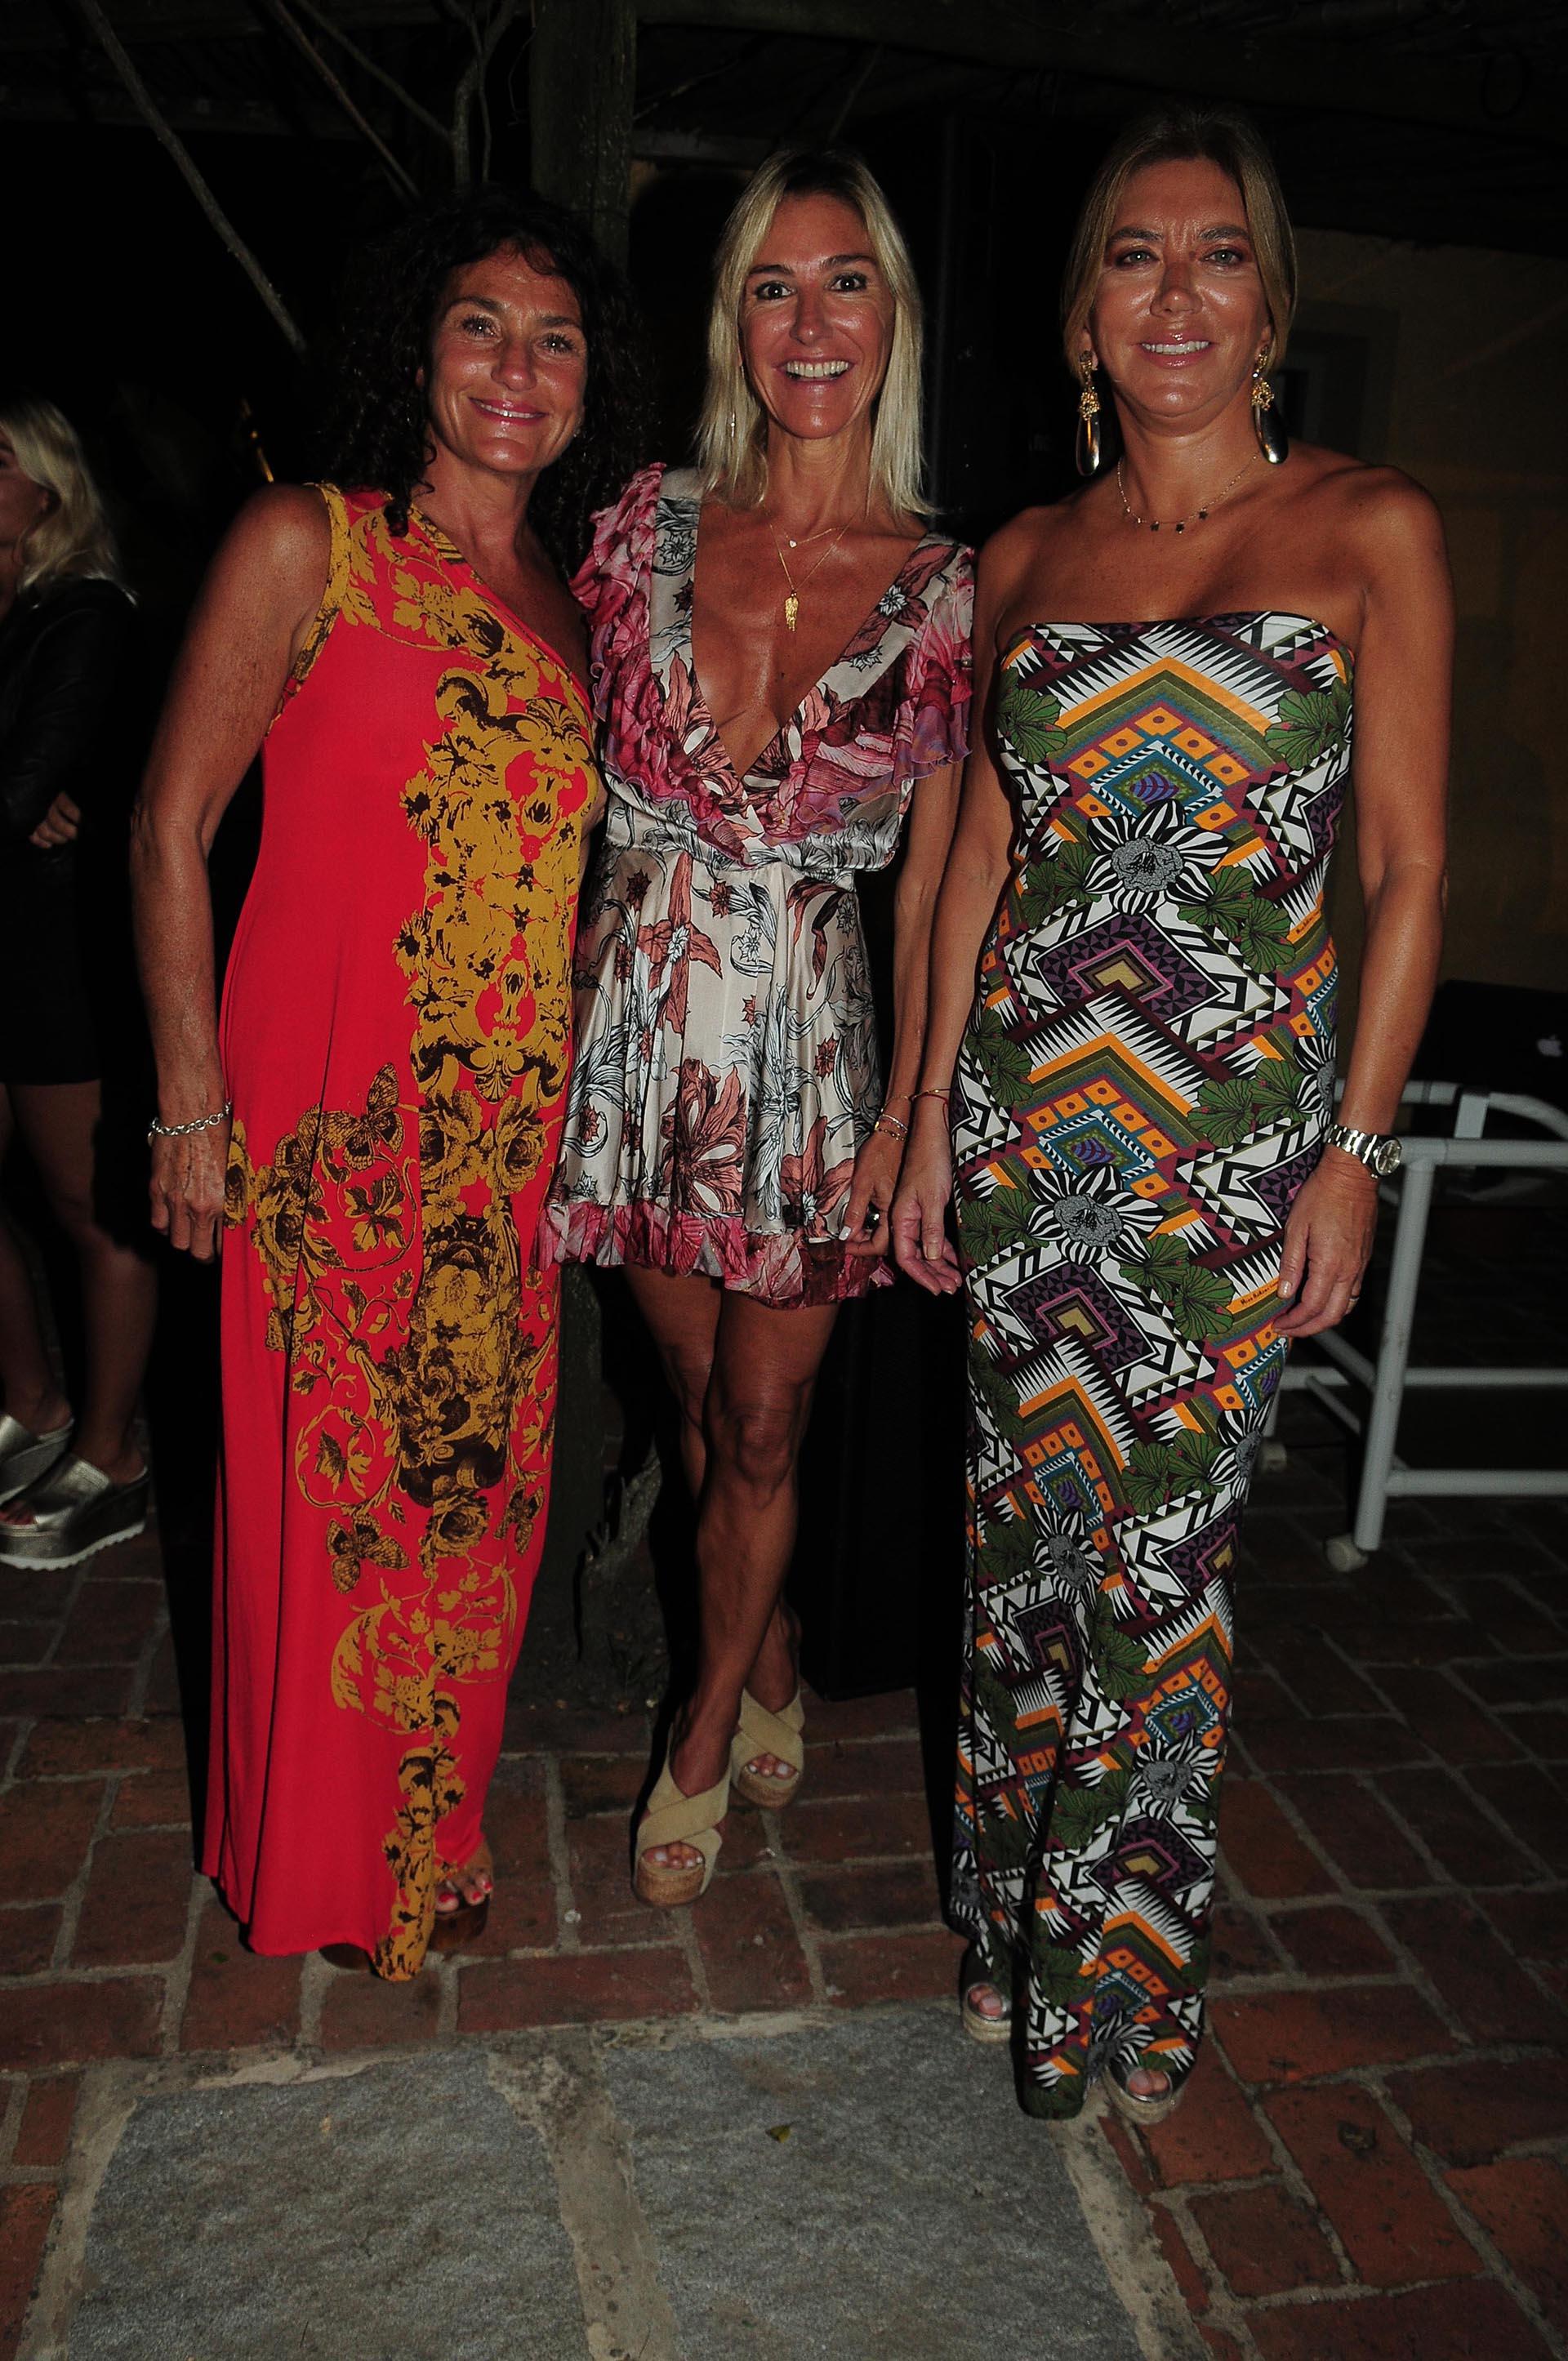 Alejandra Stefani, Gabriela Castellani y Bettina Bulgheroni